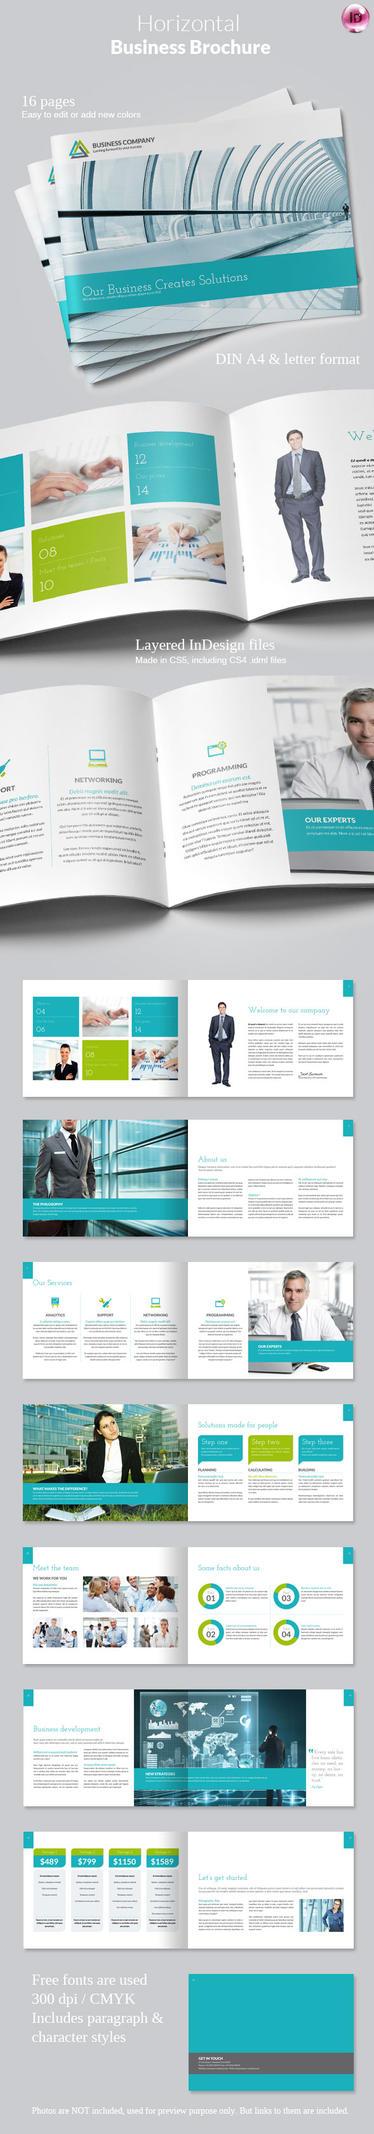 Horizontal business brochure by imagearea on deviantart for Horizontal brochure template